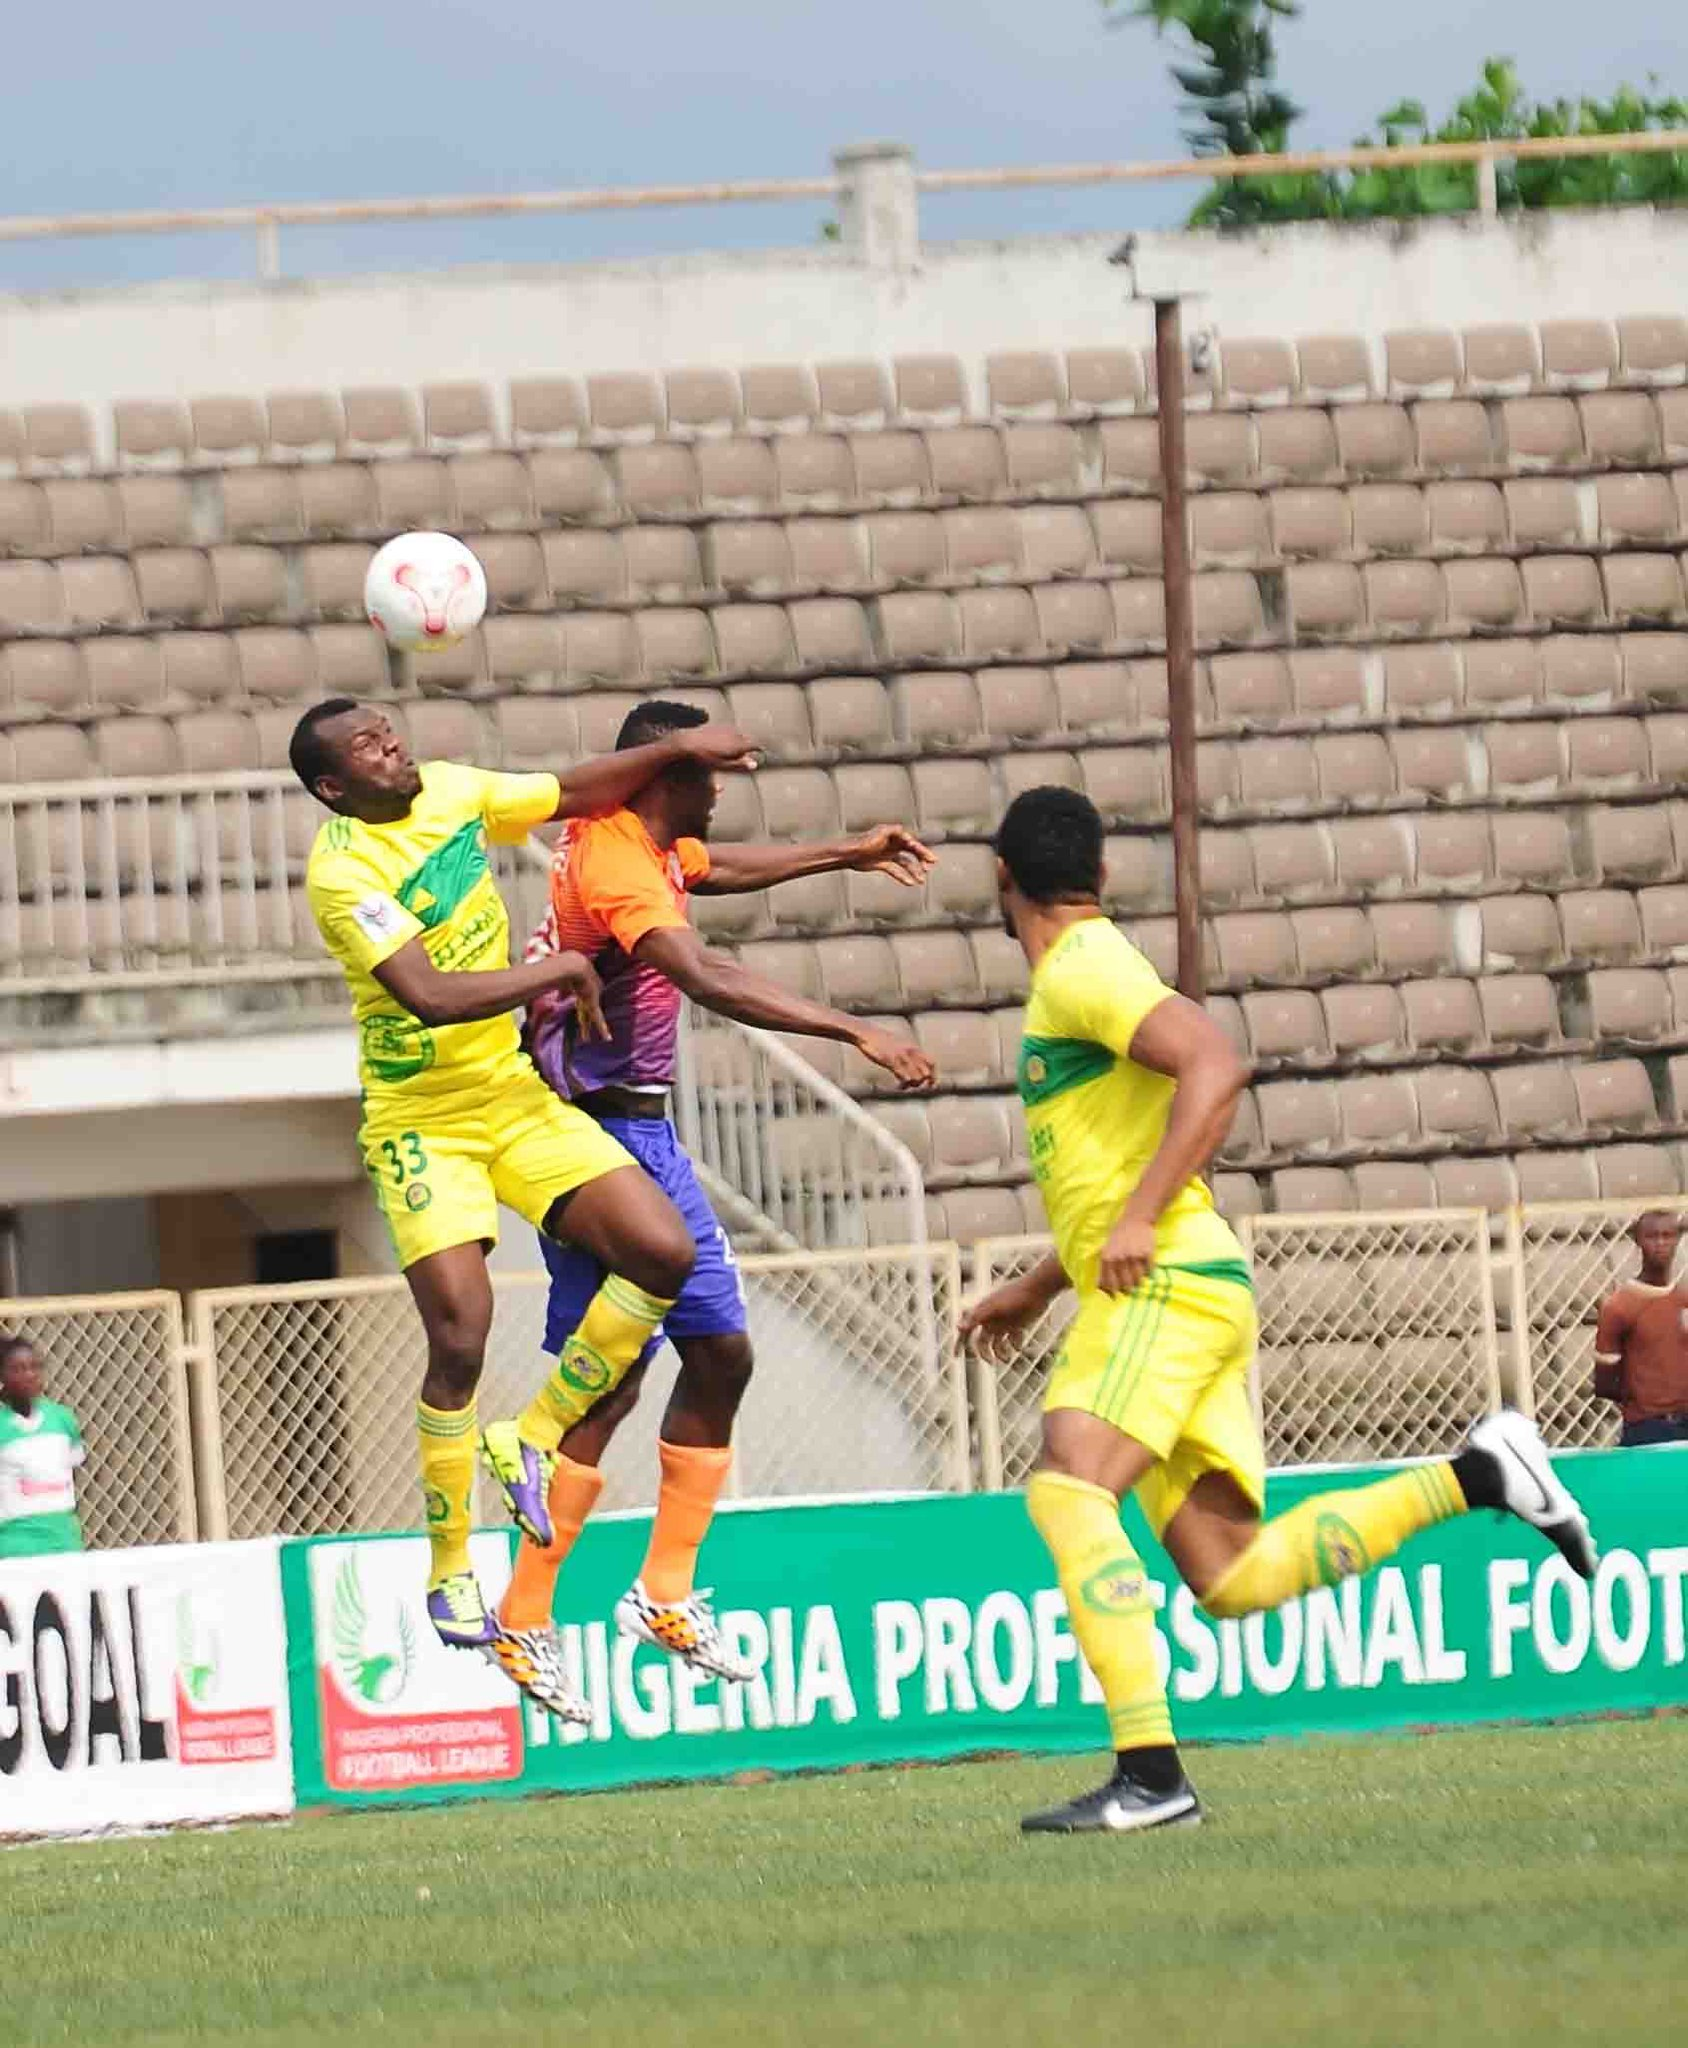 NPFL: 3SC Pip Enyimba As Sunshine Win; Rangers Fall, MFM Game Shifted